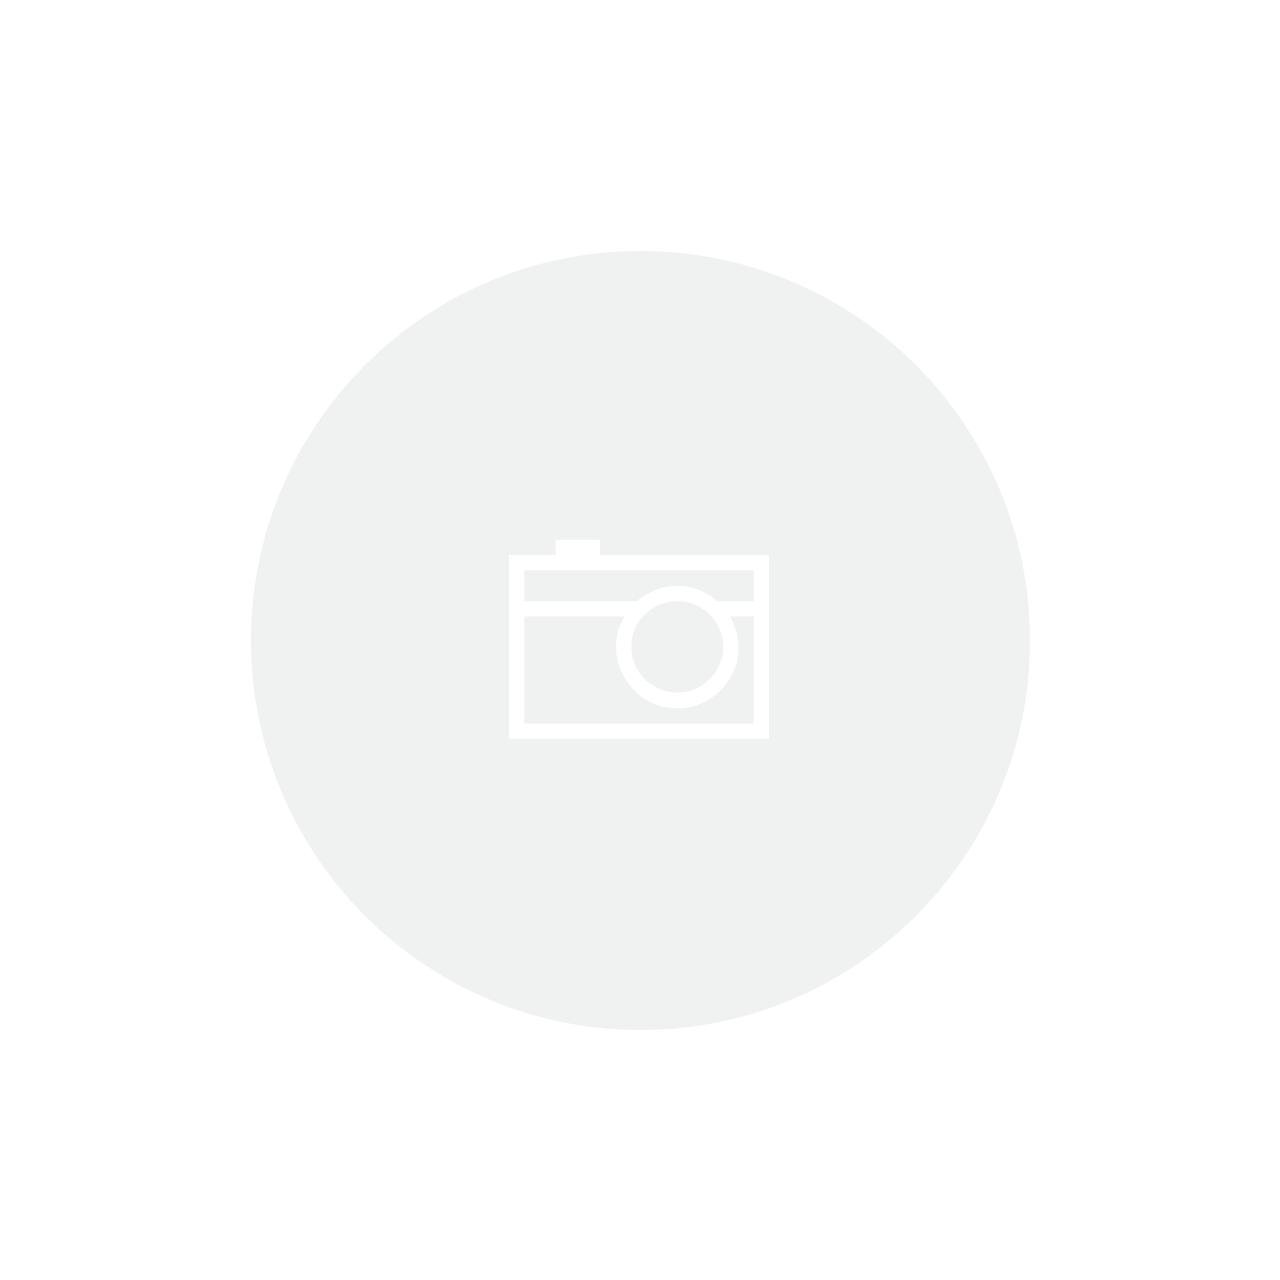 COROA 34D ICTUS NARROW WIDE ASSIMÉTRICA BCD 96mm (12V)